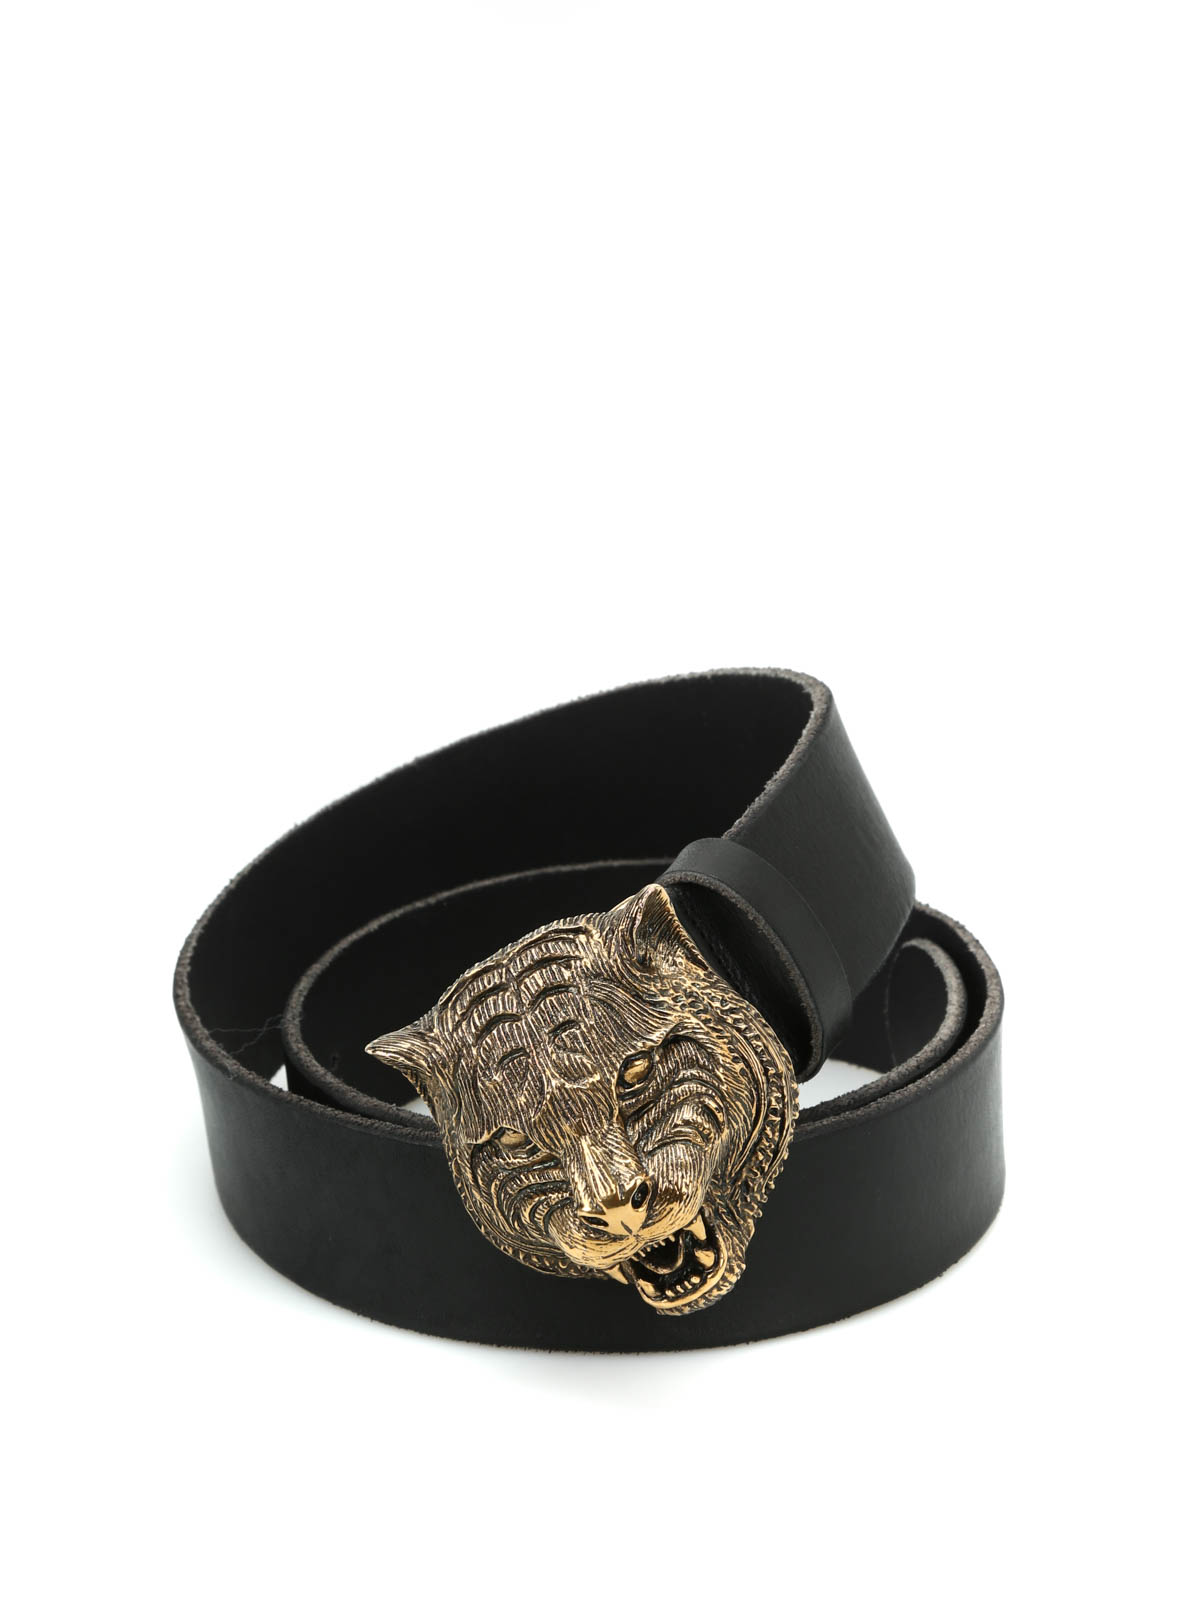 9829f97305f Gucci - Feline buckle leather belt - belts - 409420 CVE0T 1000 ...